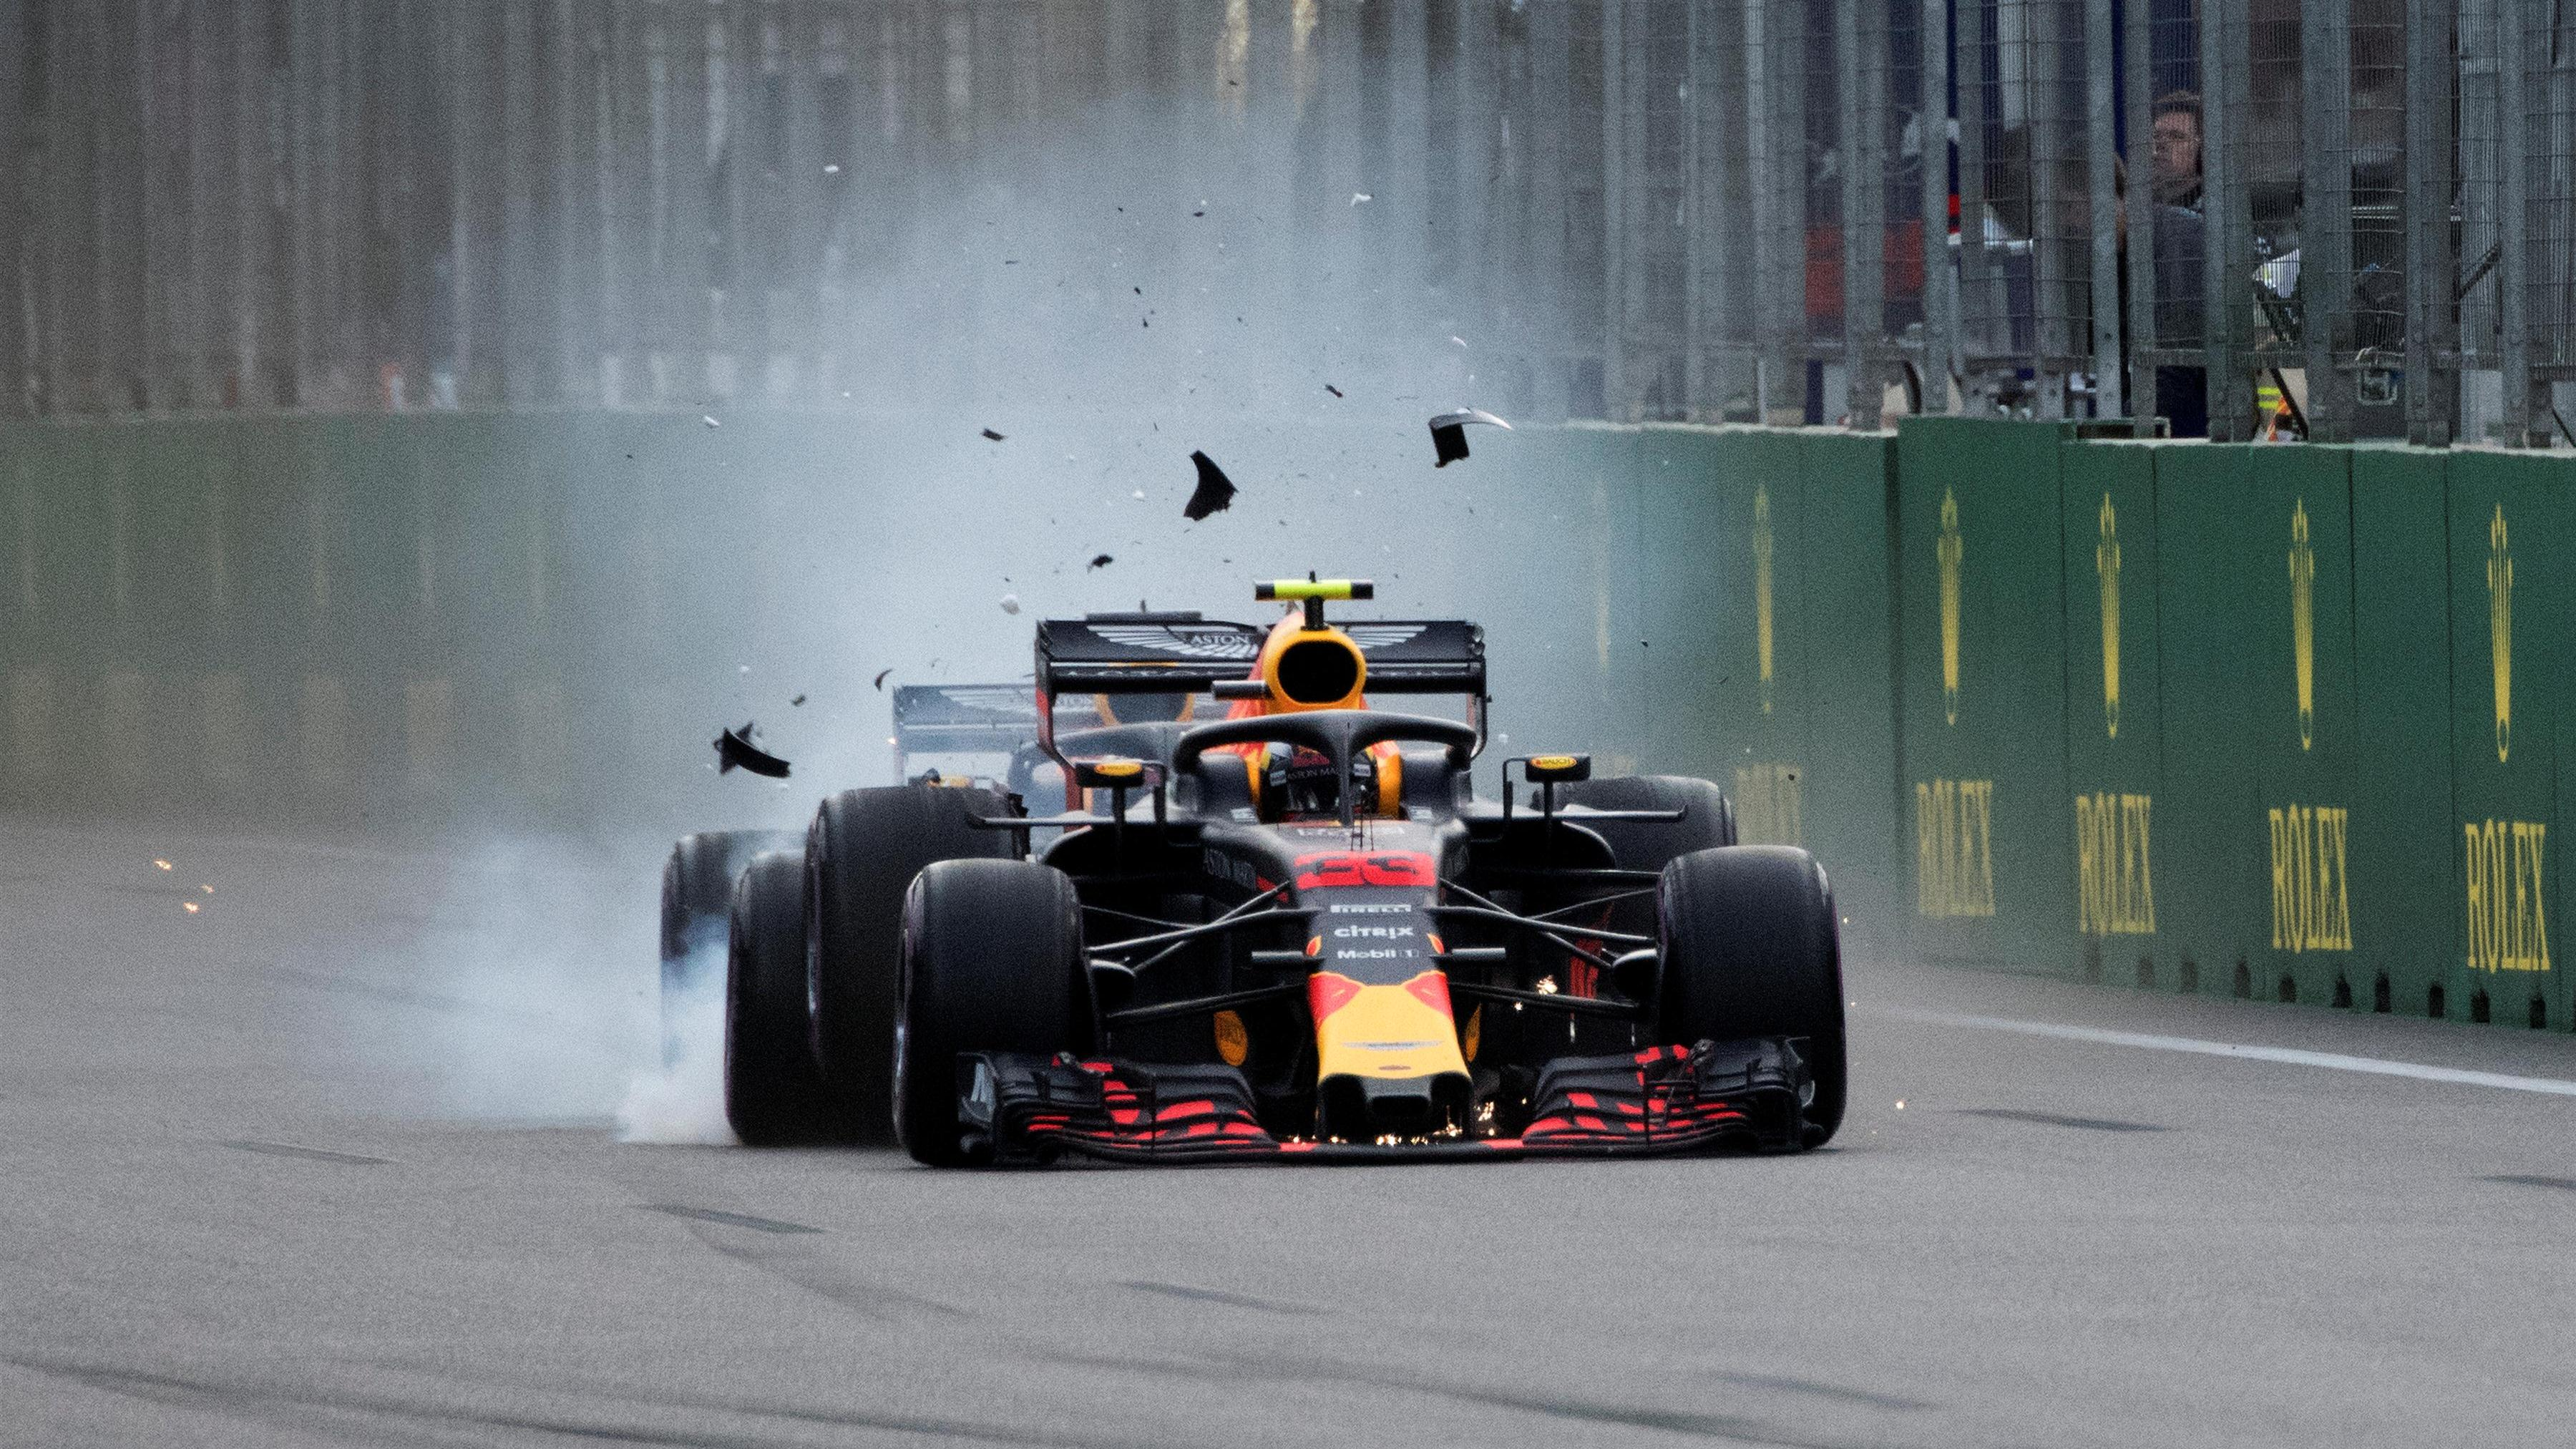 Horner: Ricciardo and Verstappen both to blame for clash